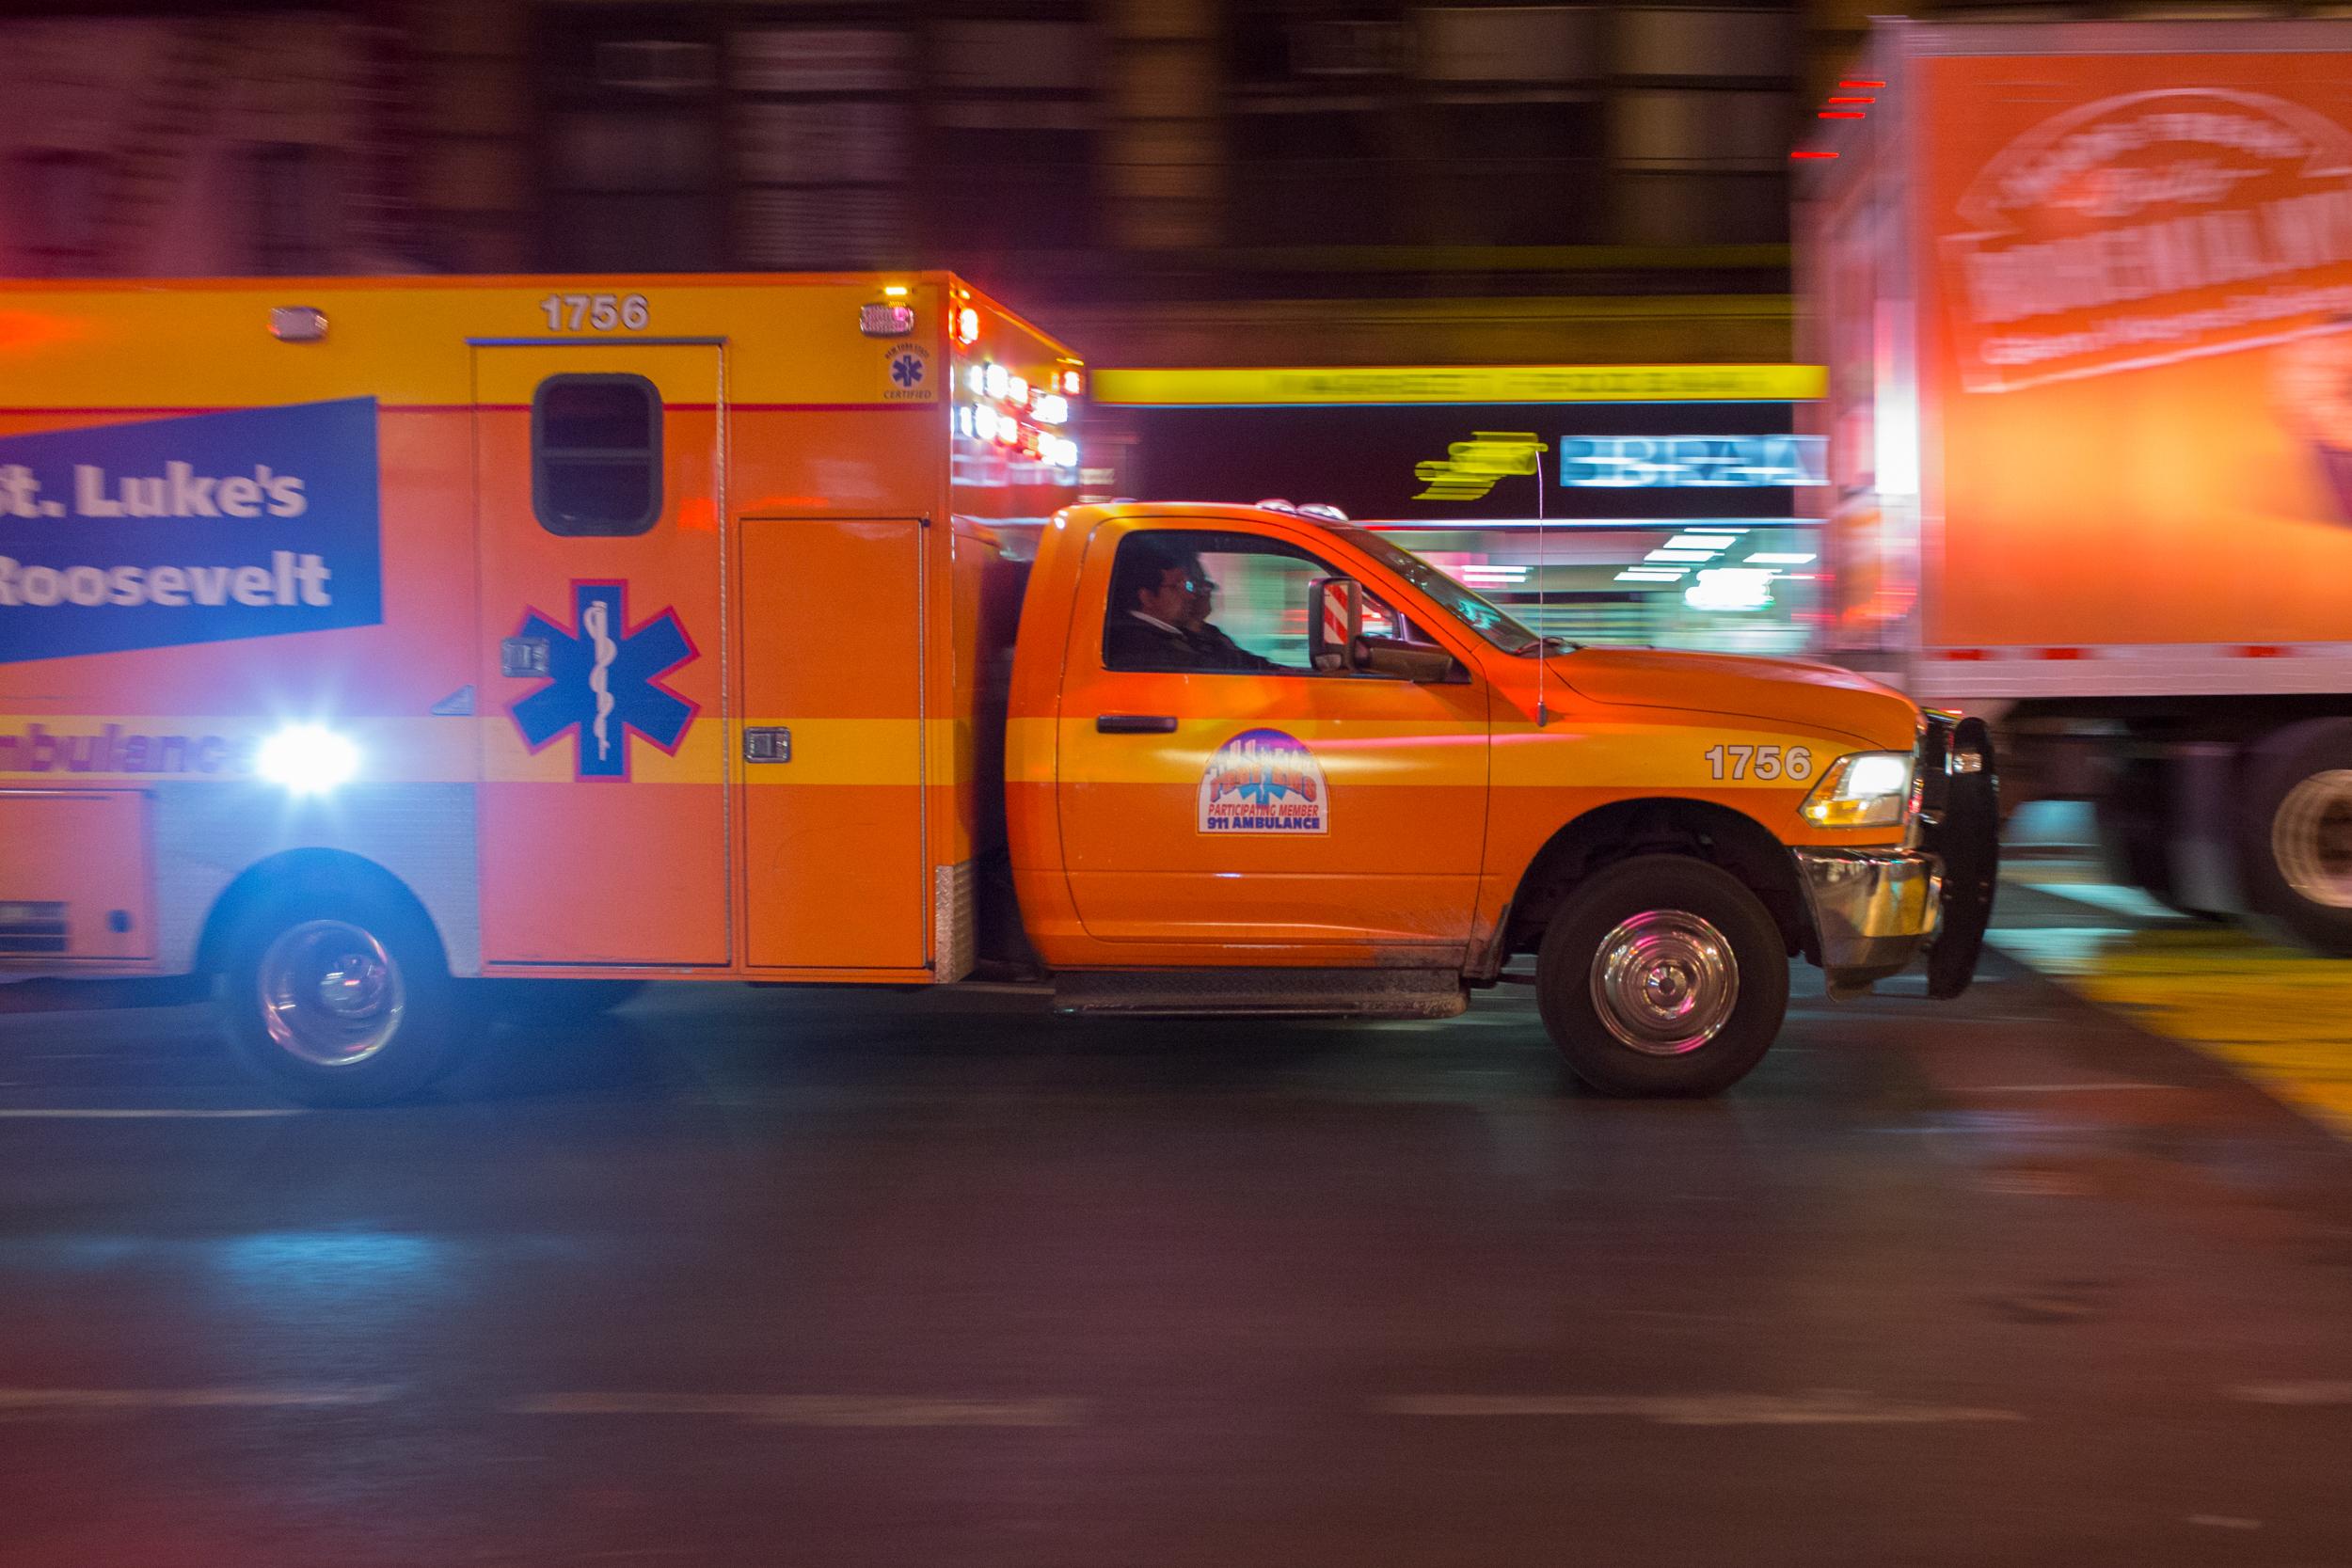 Ambulance en route in Manhattan, N.Y. on Oct. 23, 2015.